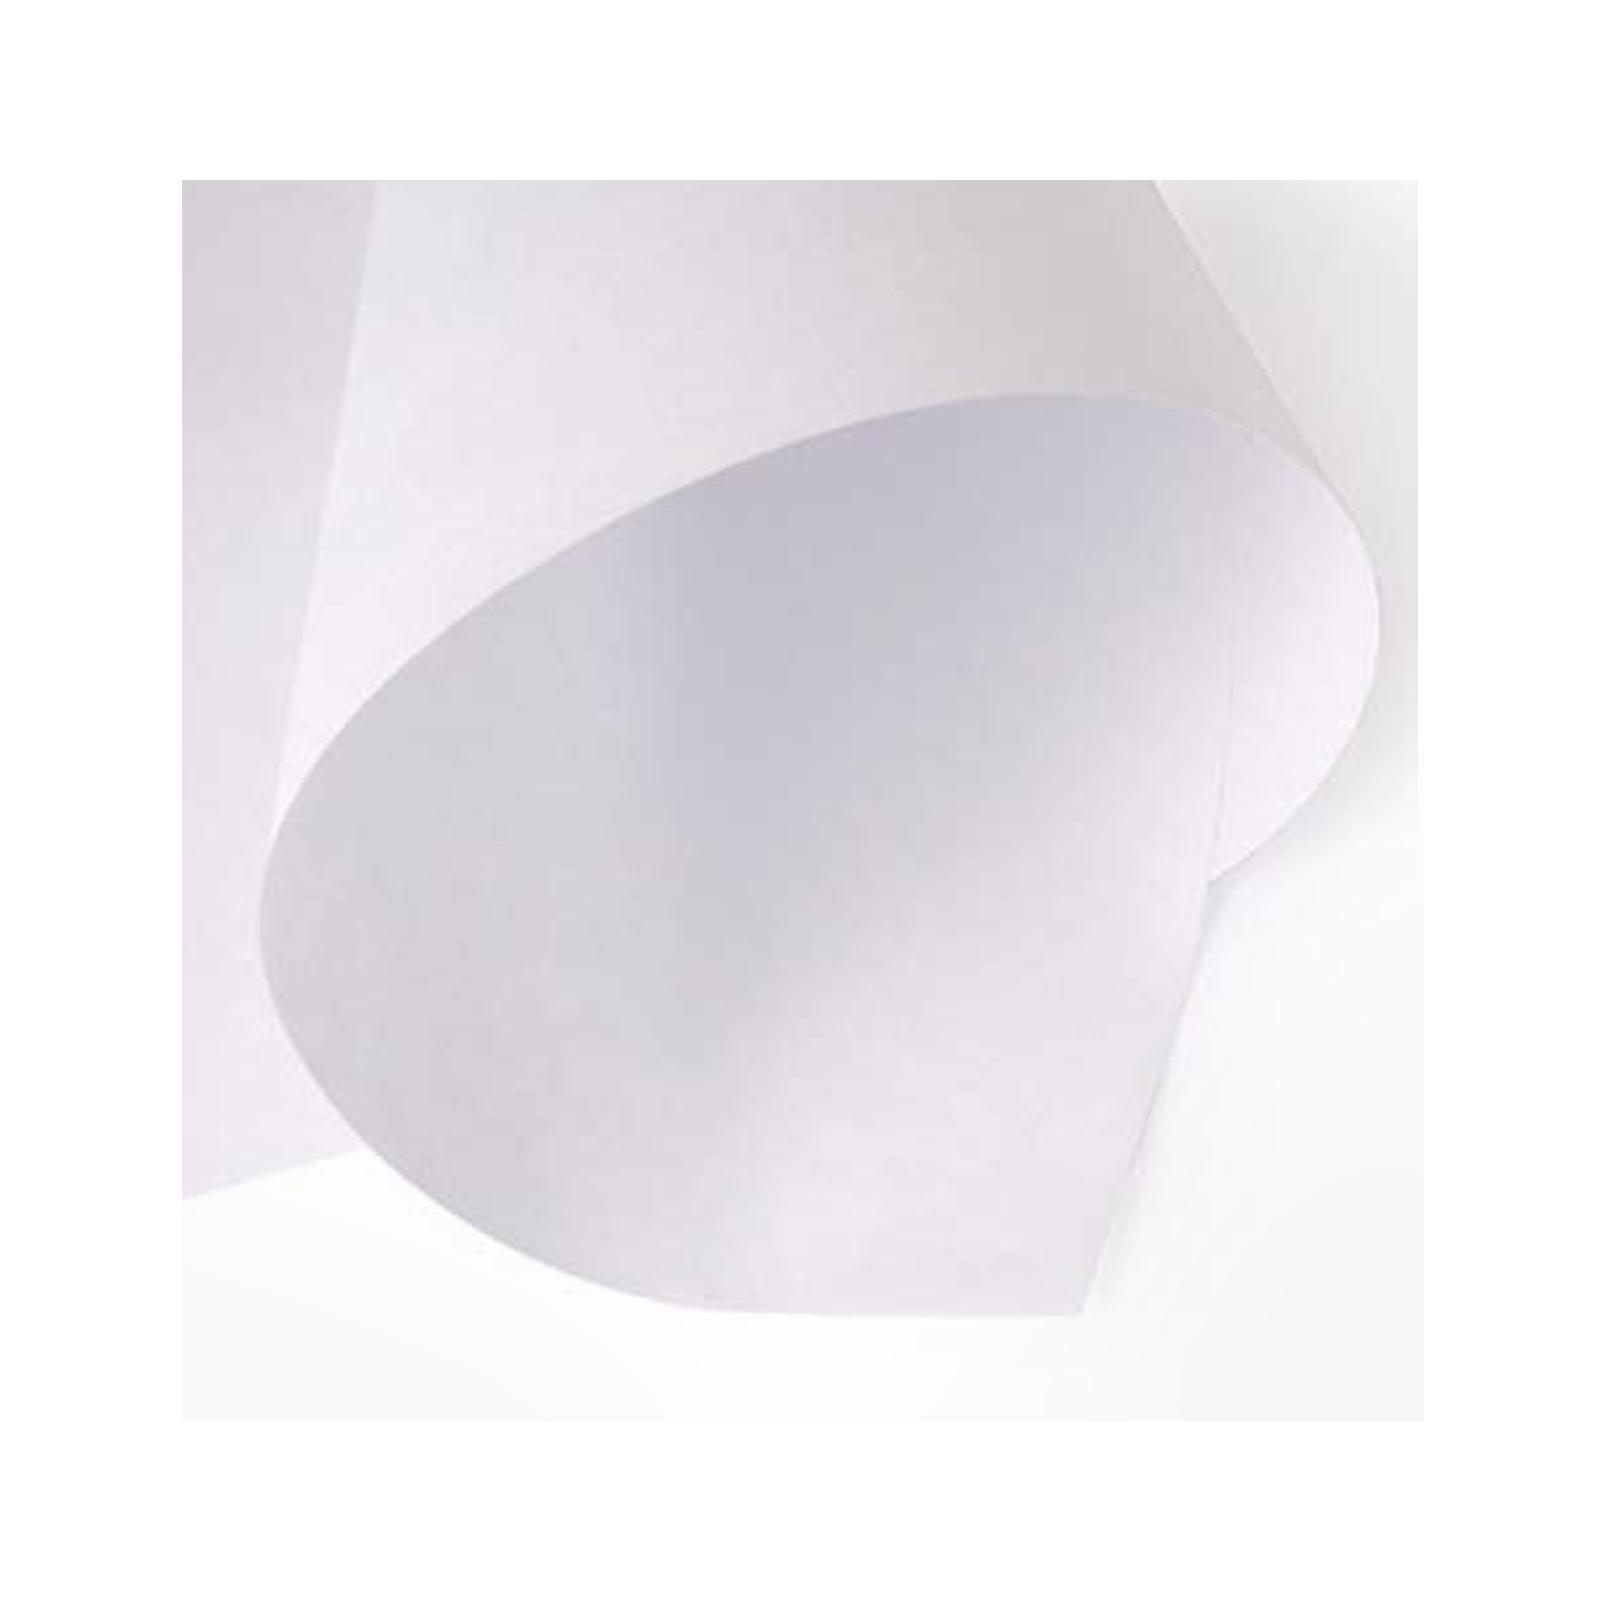 Awagami Masa 86GSM 21.5X31 Bright White